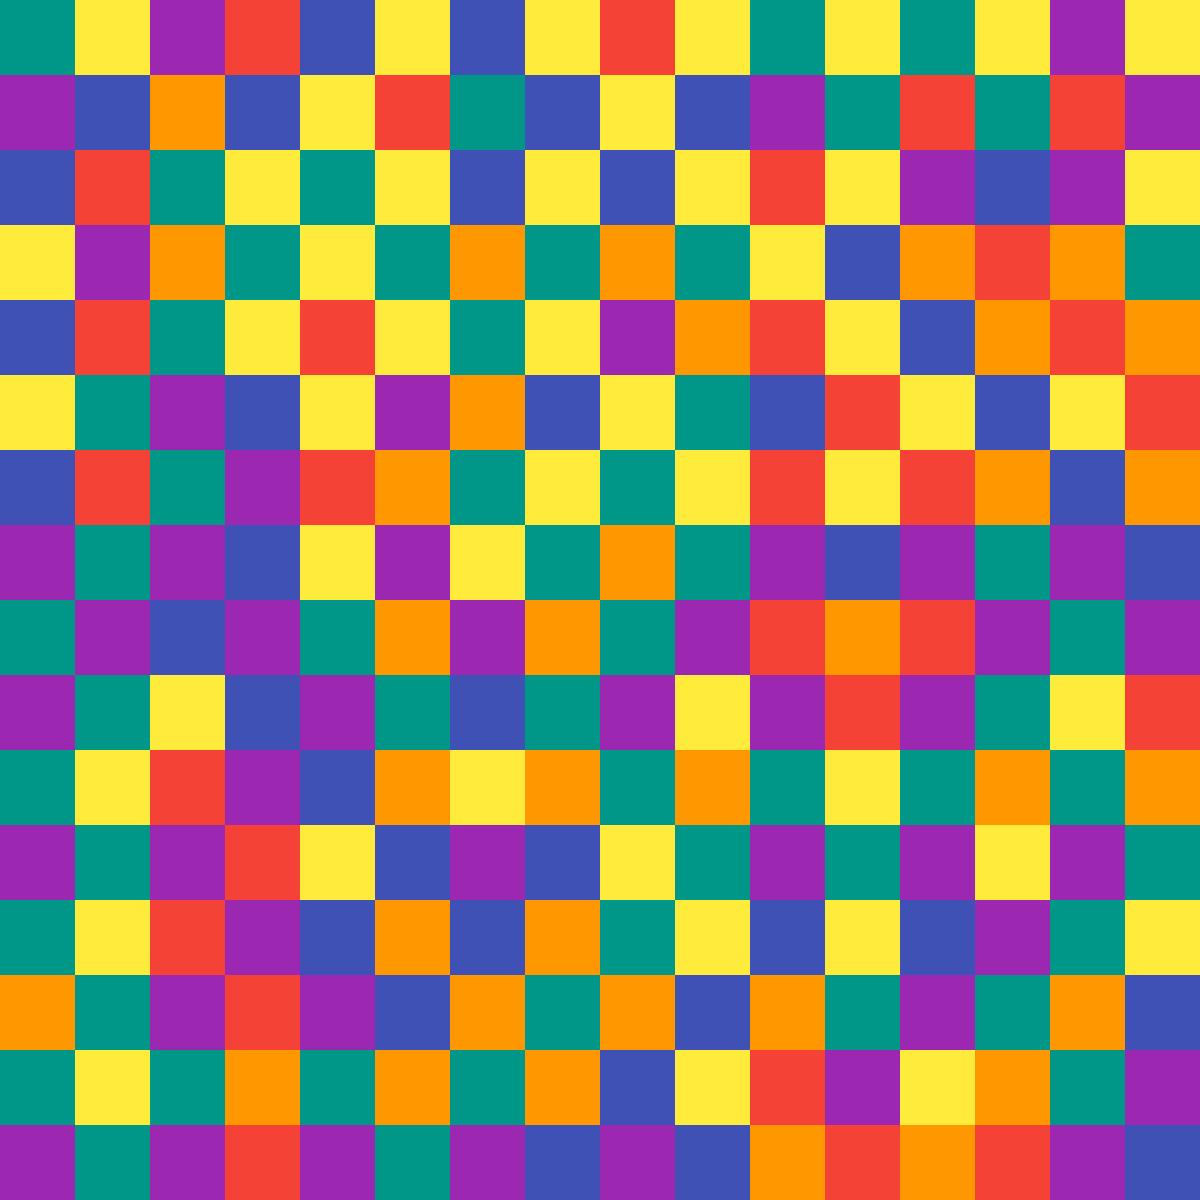 16x16 by kgratia